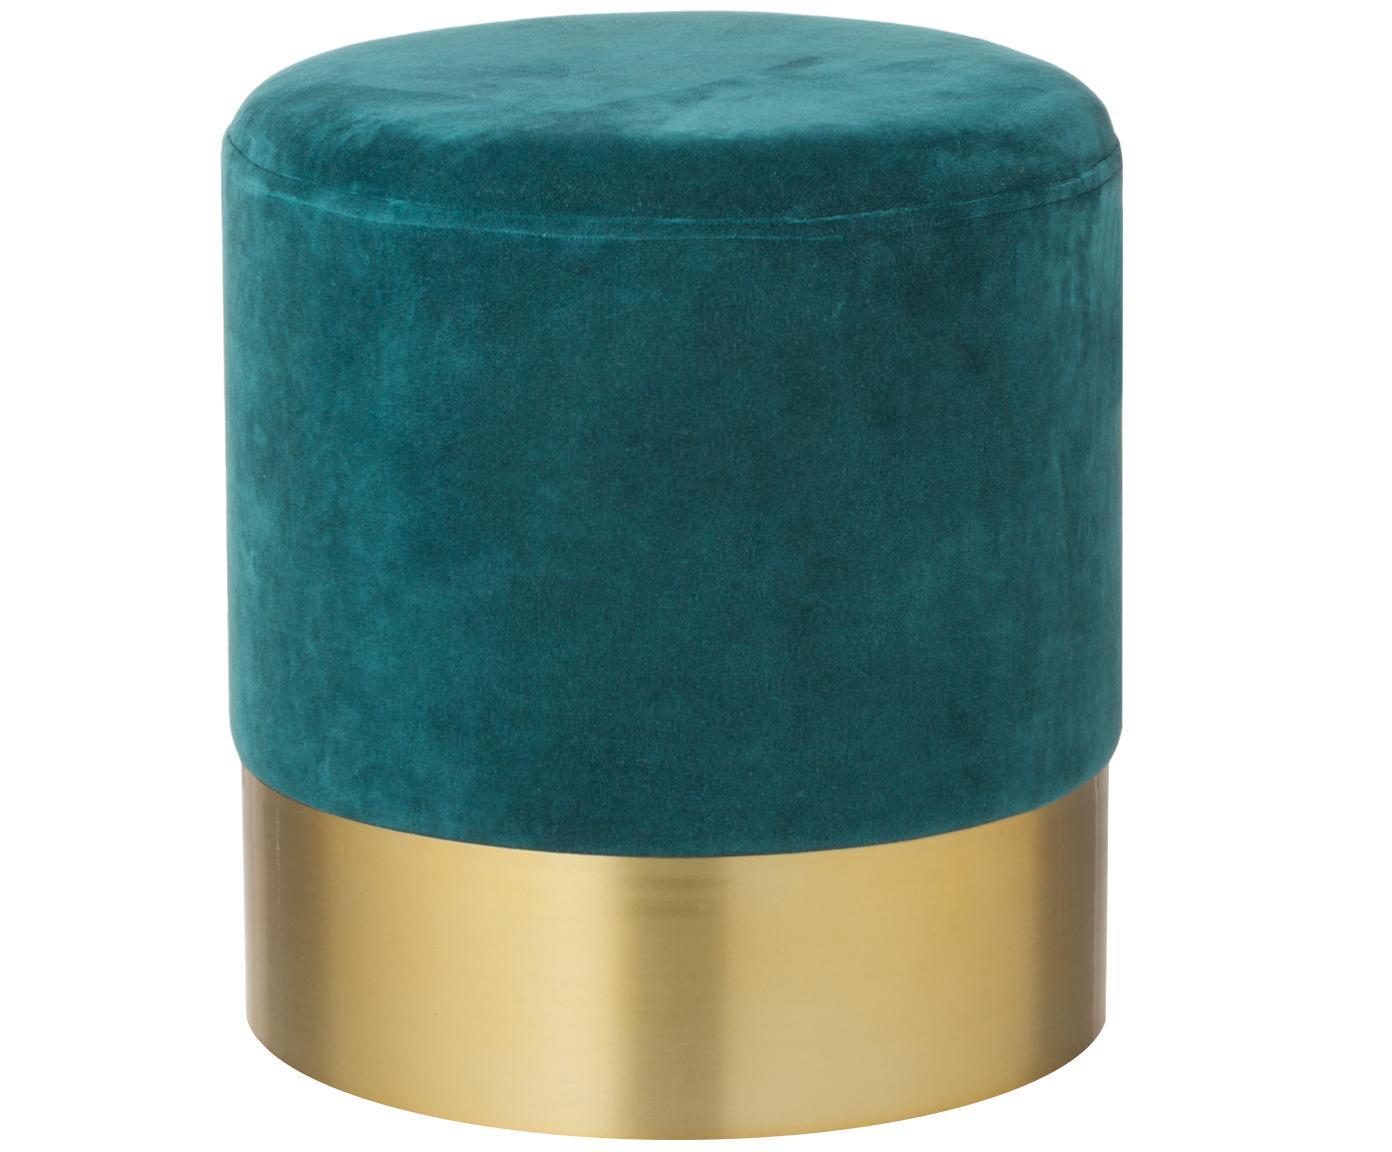 Samt-Hocker Harlow, Bezug: Baumwollsamt, Petrol, Goldfarben, Ø 38 x H 42 cm